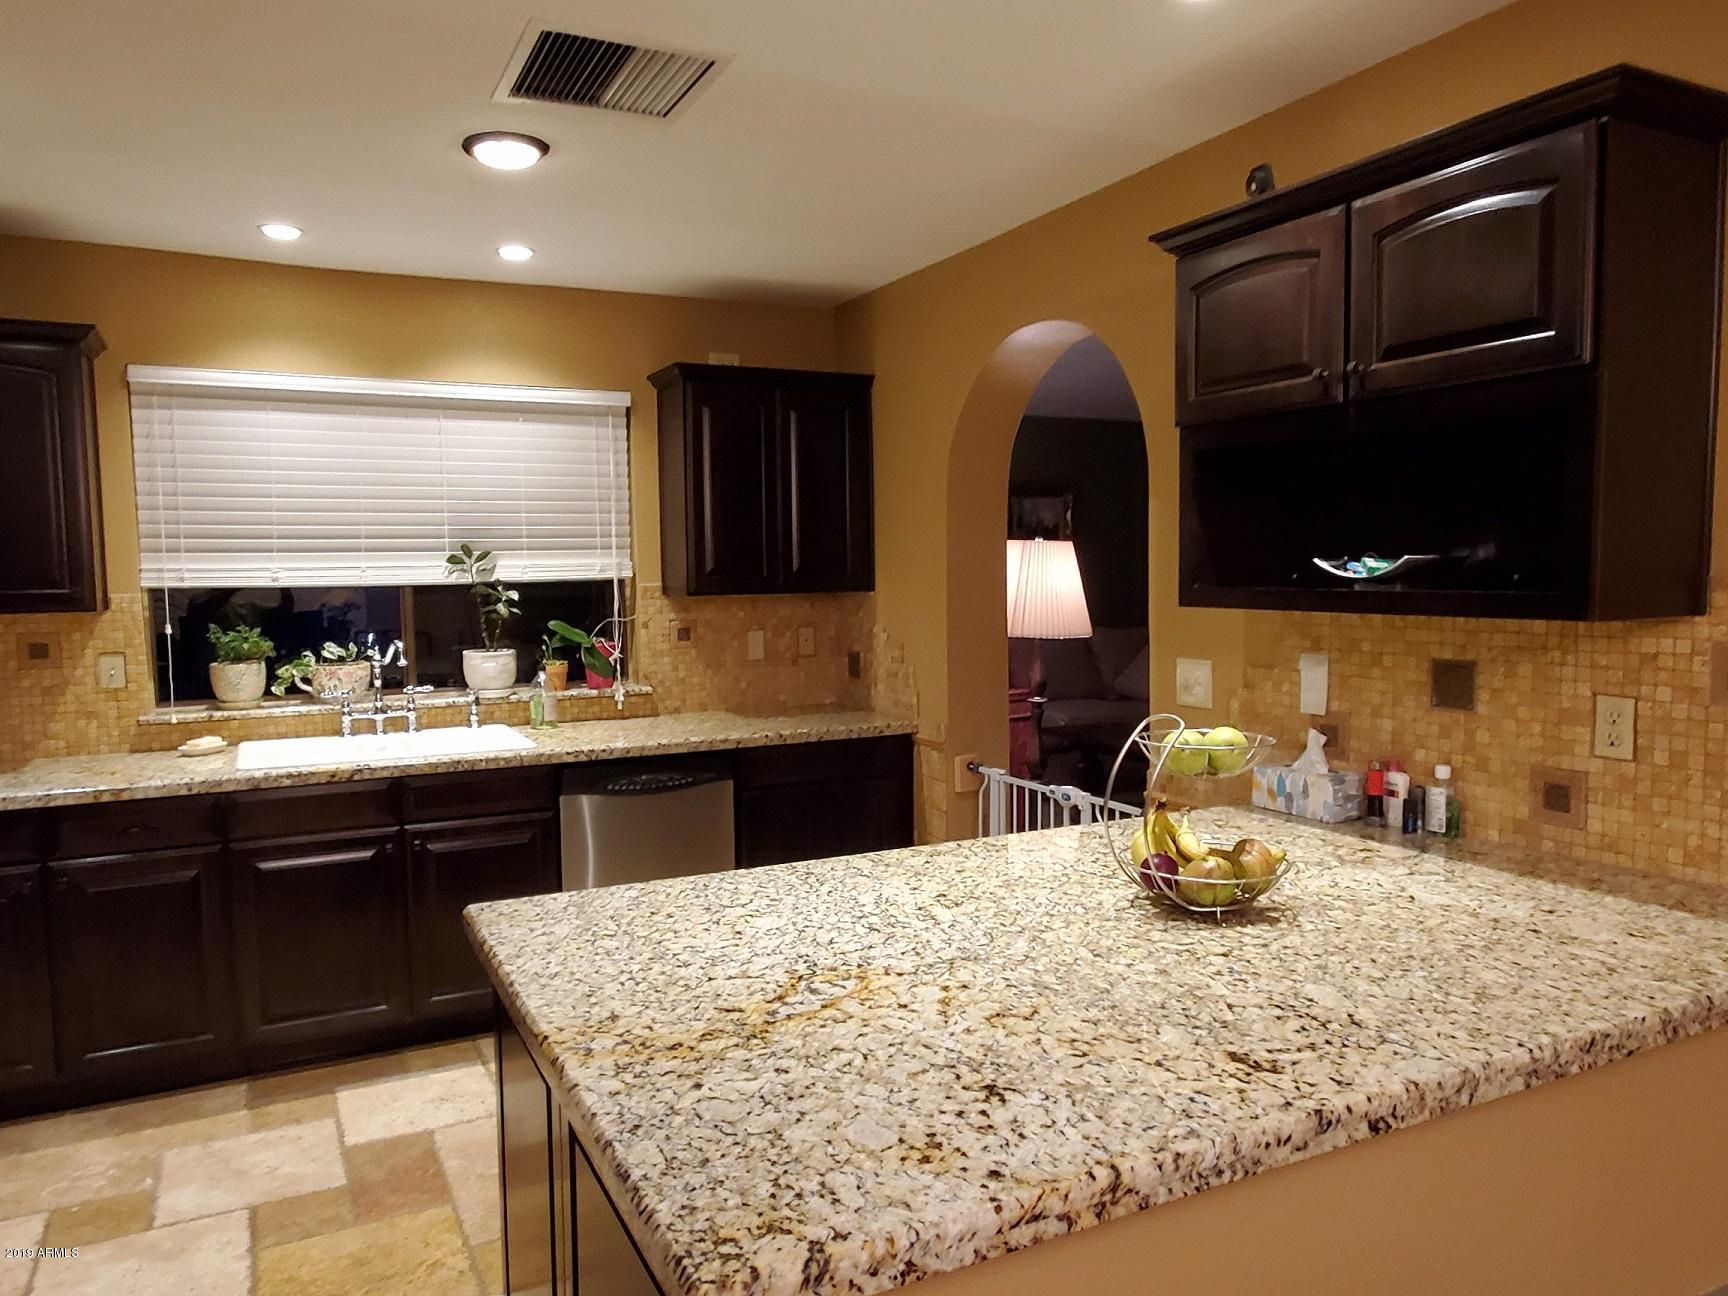 MLS 5961552 1184 N VILLA NUEVA Drive, Litchfield Park, AZ 85340 Litchfield Park AZ Three Bedroom